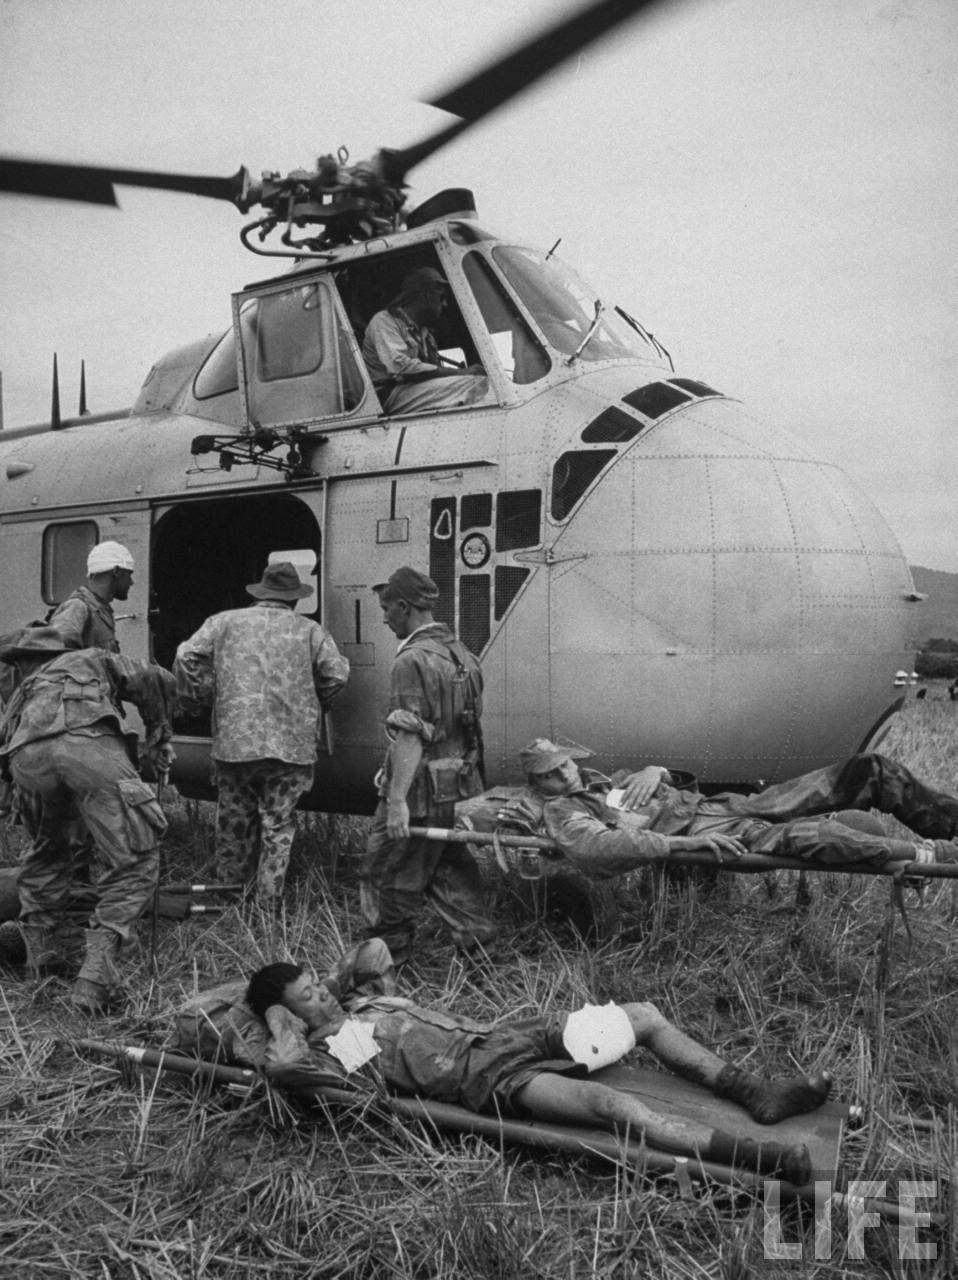 Épinglé sur The War in Indochina 19451979